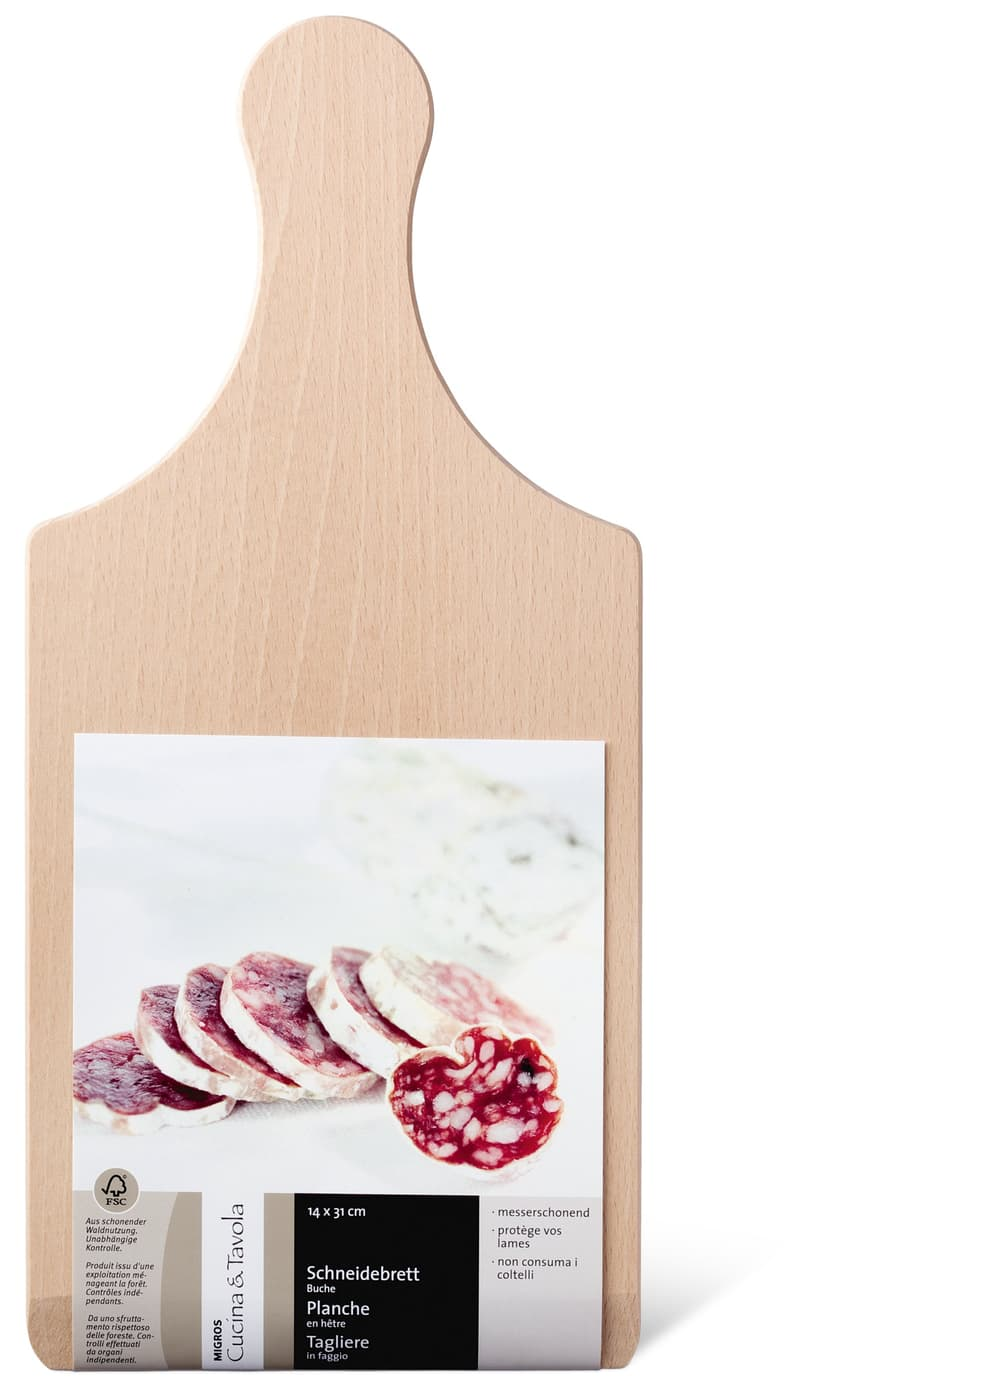 Schneidebrett cucina tavola migros for Tavola cucina